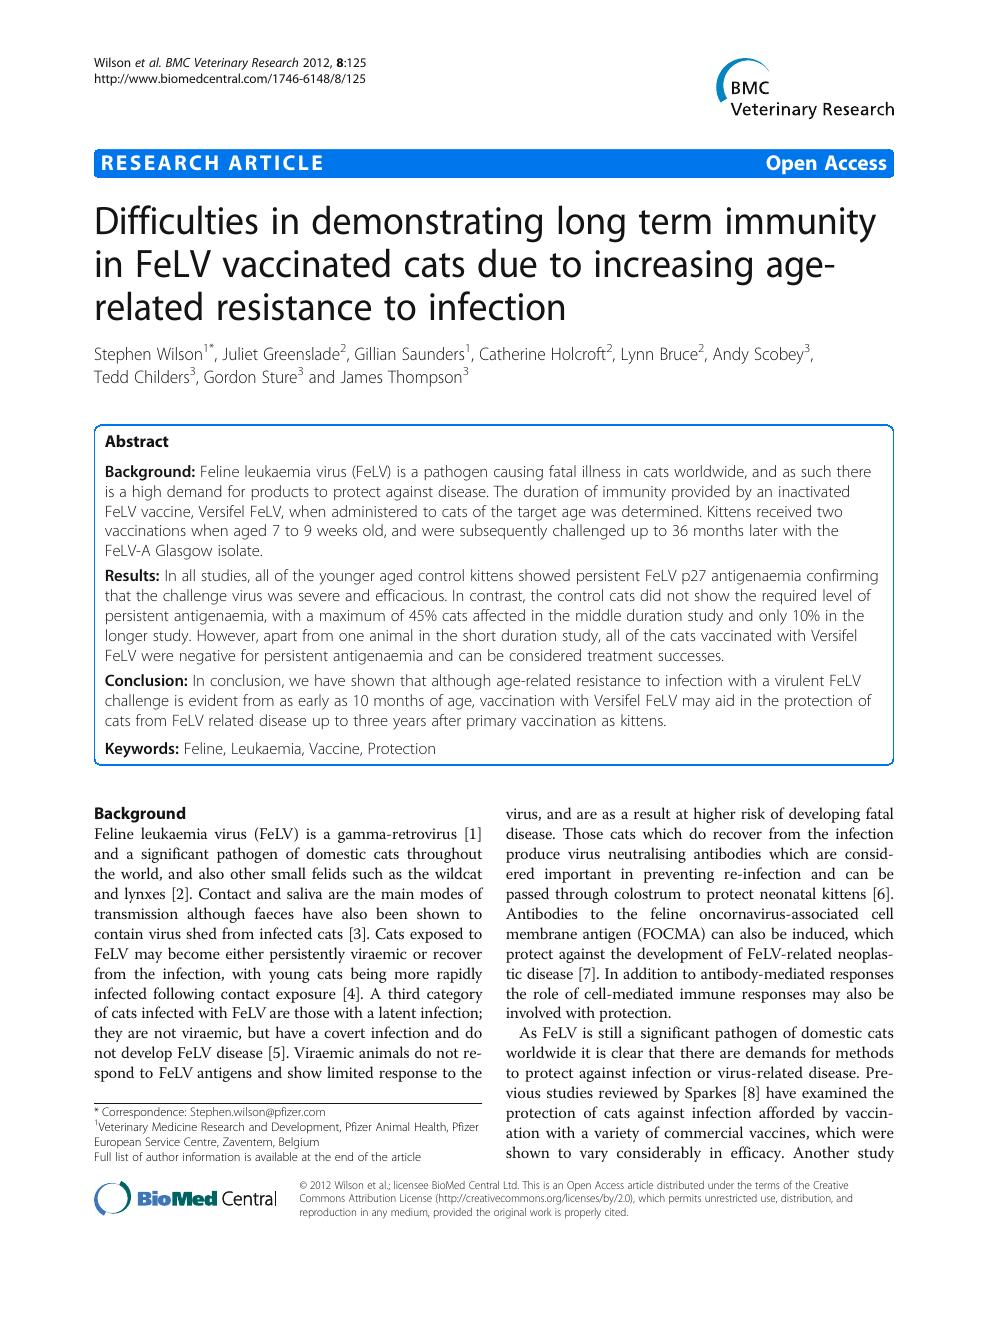 Difficulties in demonstrating long term immunity in FeLV